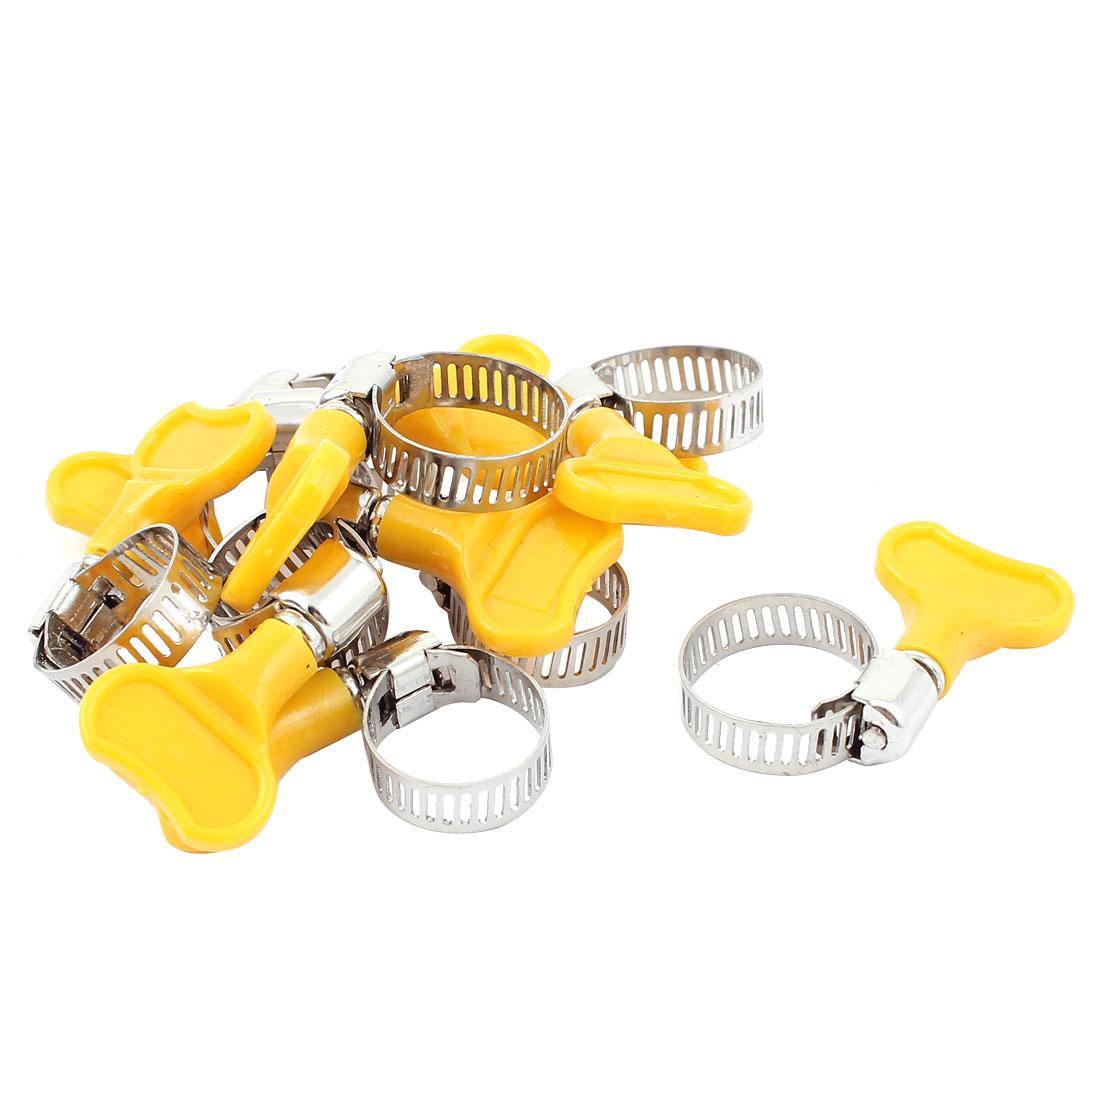 Adjustable 17 - 22mm Range Band Worm Gear Pipe Hose Clip Fastener Clamp 10Pcs